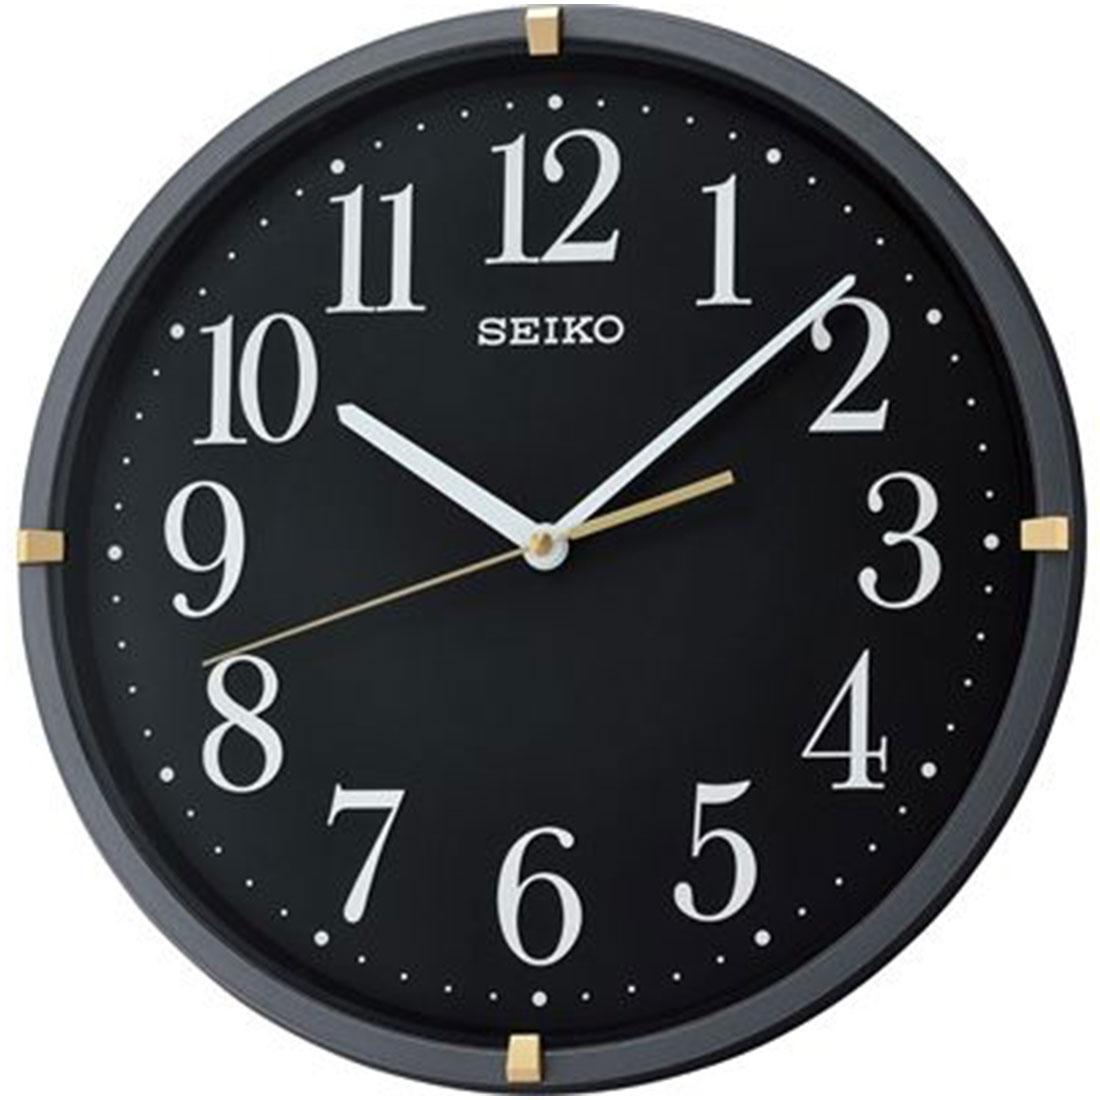 Seiko Black Decor Analog Round Wall Clock QXA746J